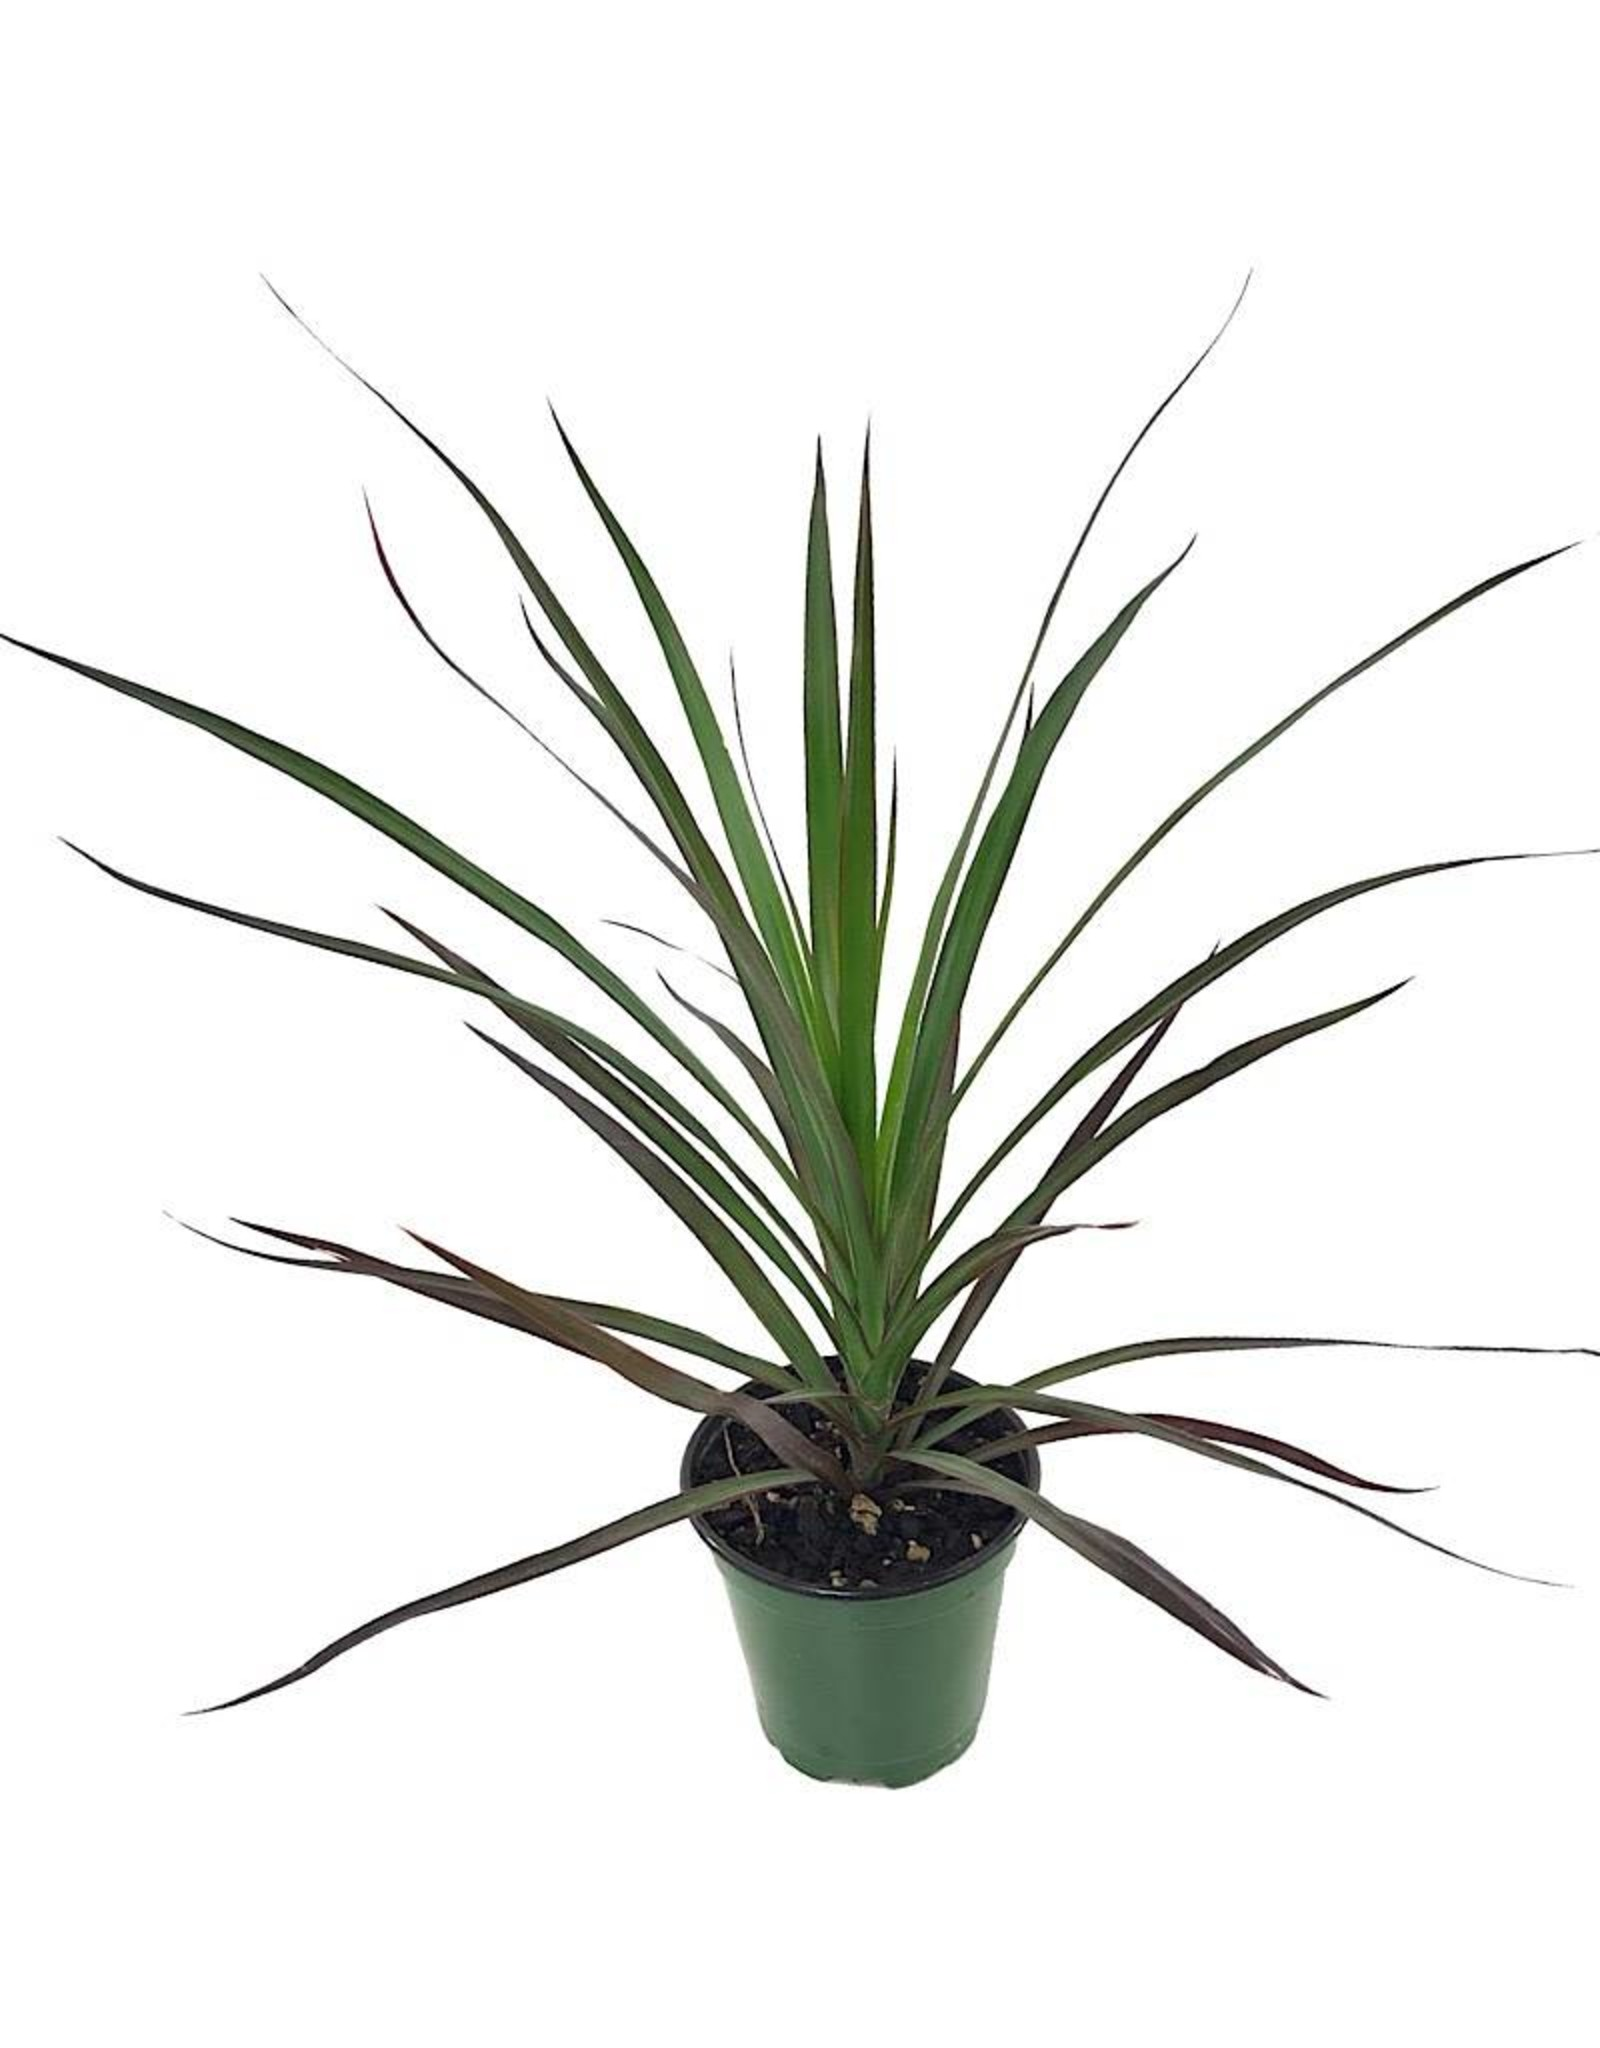 Dracaena marginata 'Magenta' 4 inch